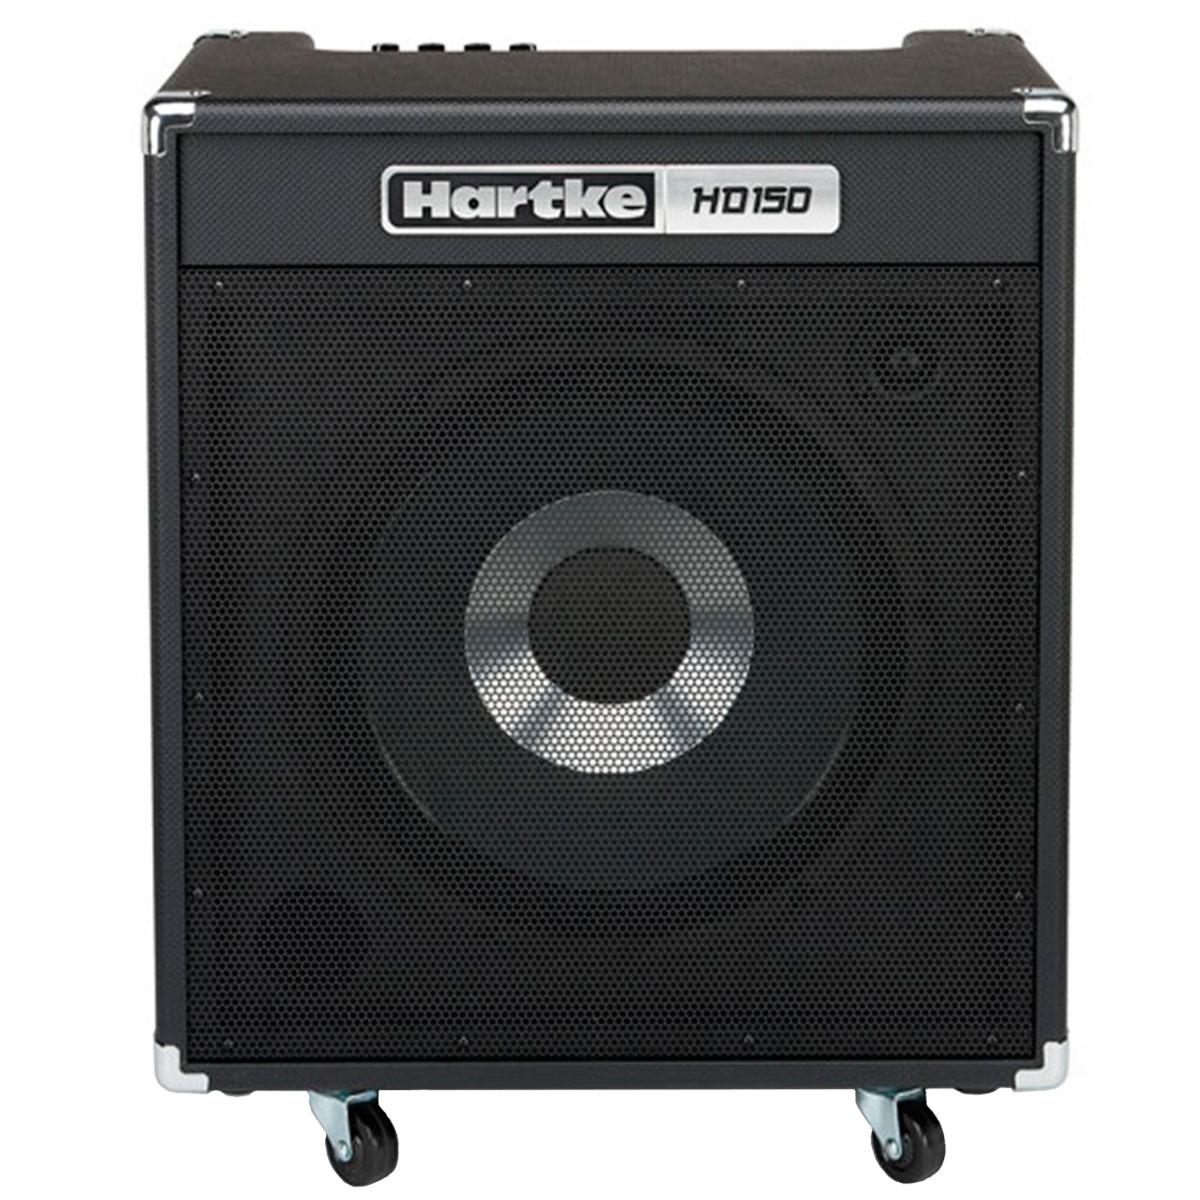 HD150 - Amplificador Combo p/ Contrabaixo HD 150 - Hartke